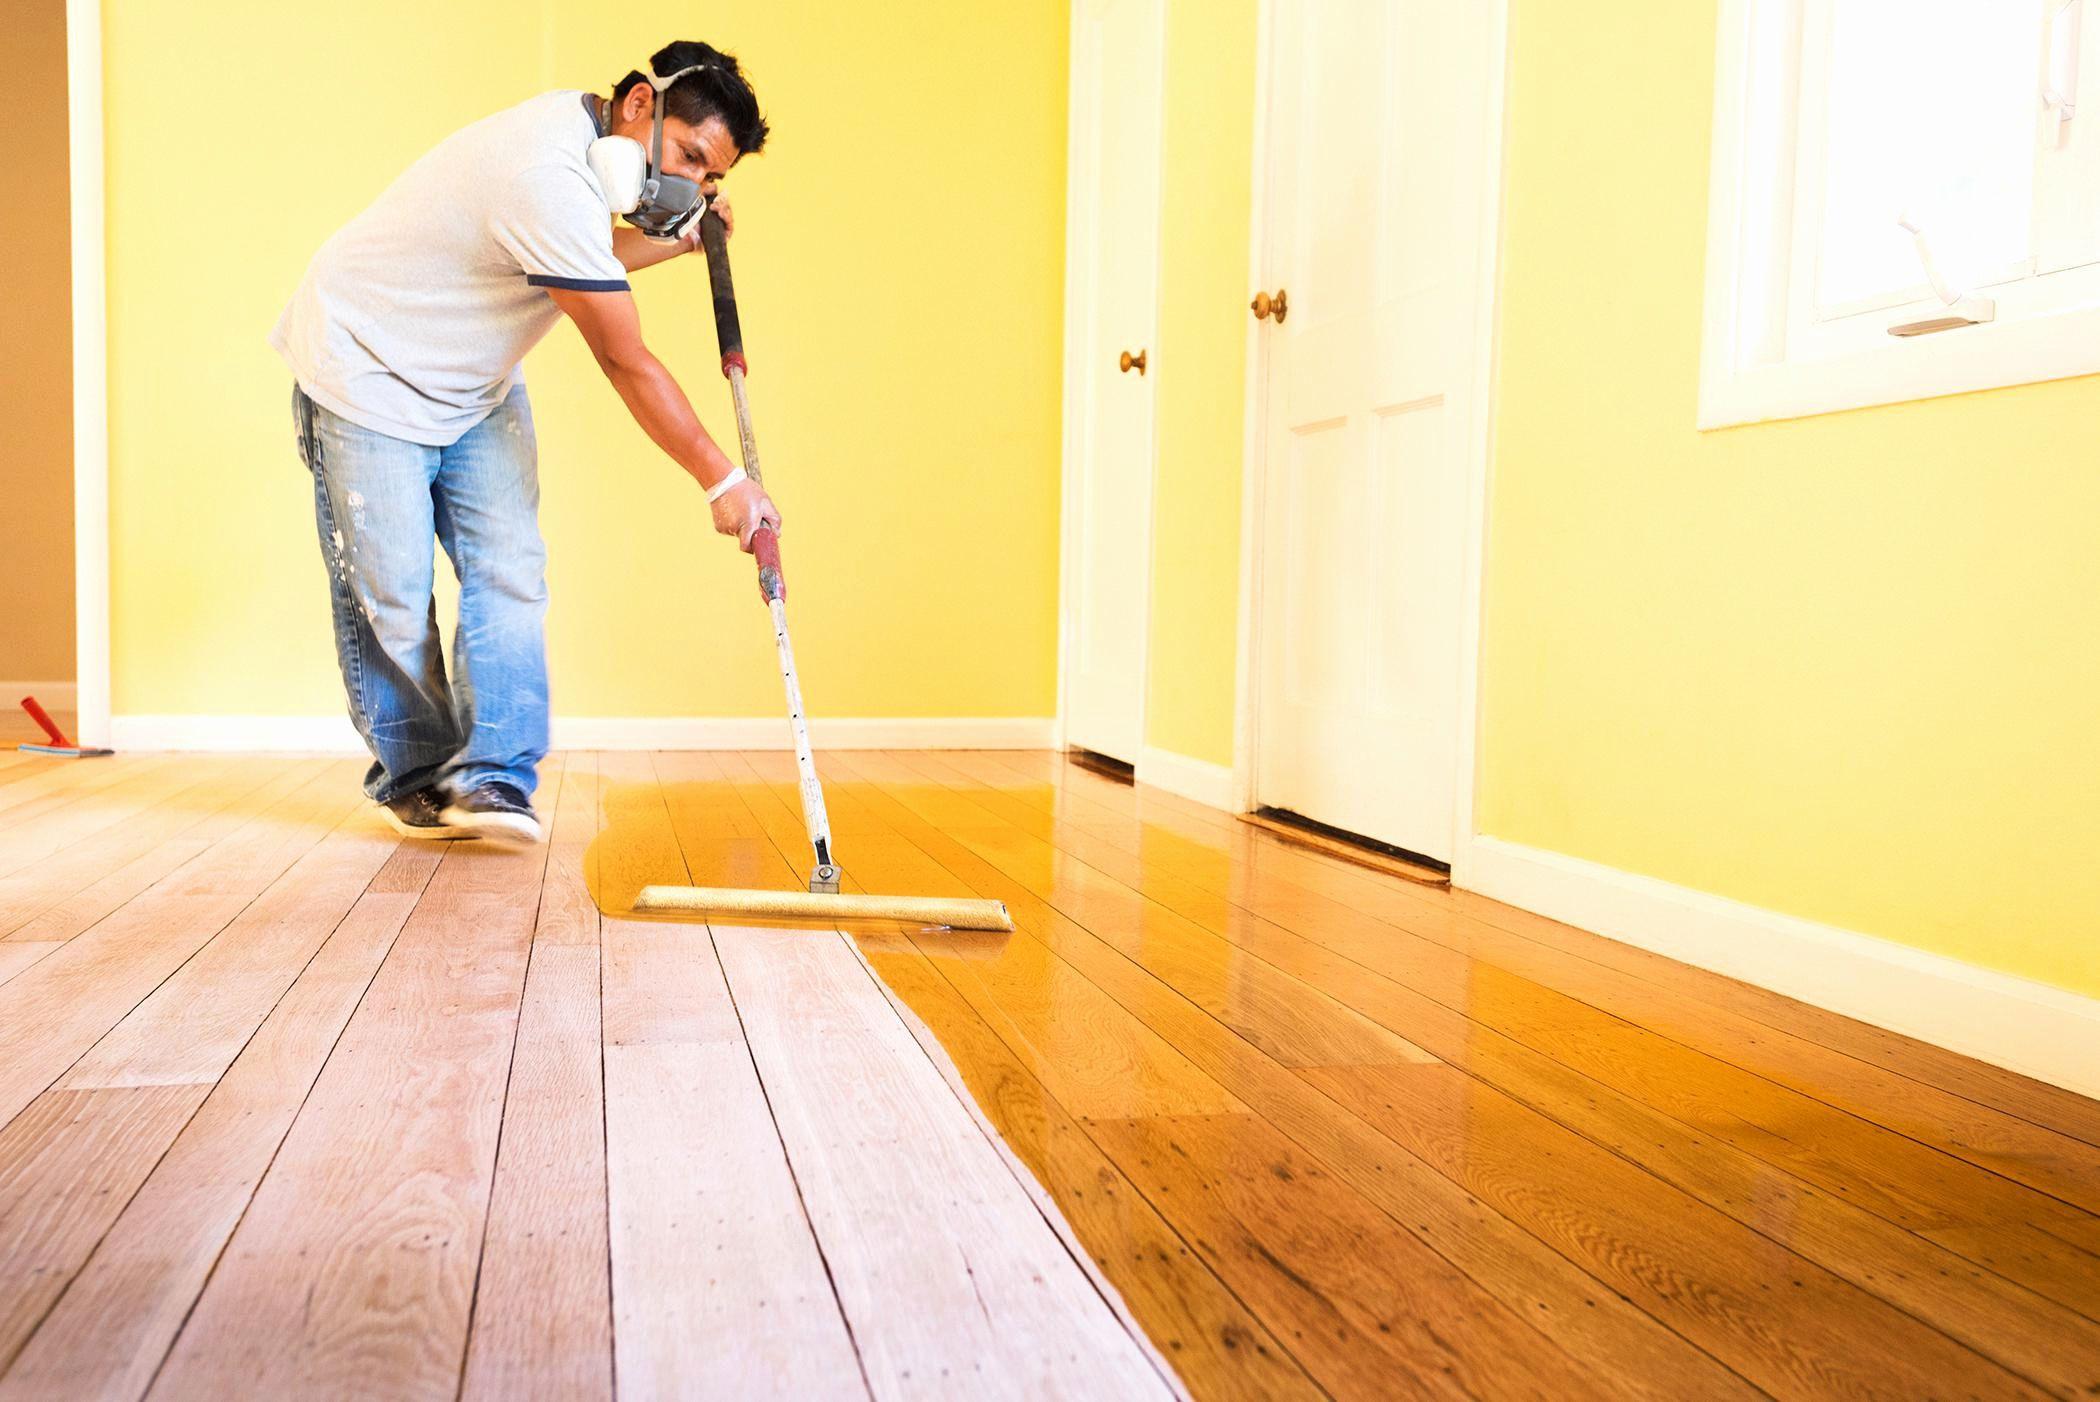 hardwood floor estimate of 40 flooring installation cost per square foot concept throughout 50 fresh hardwood flooring cost per sq ft installed 50 ideas of flooring installation cost per